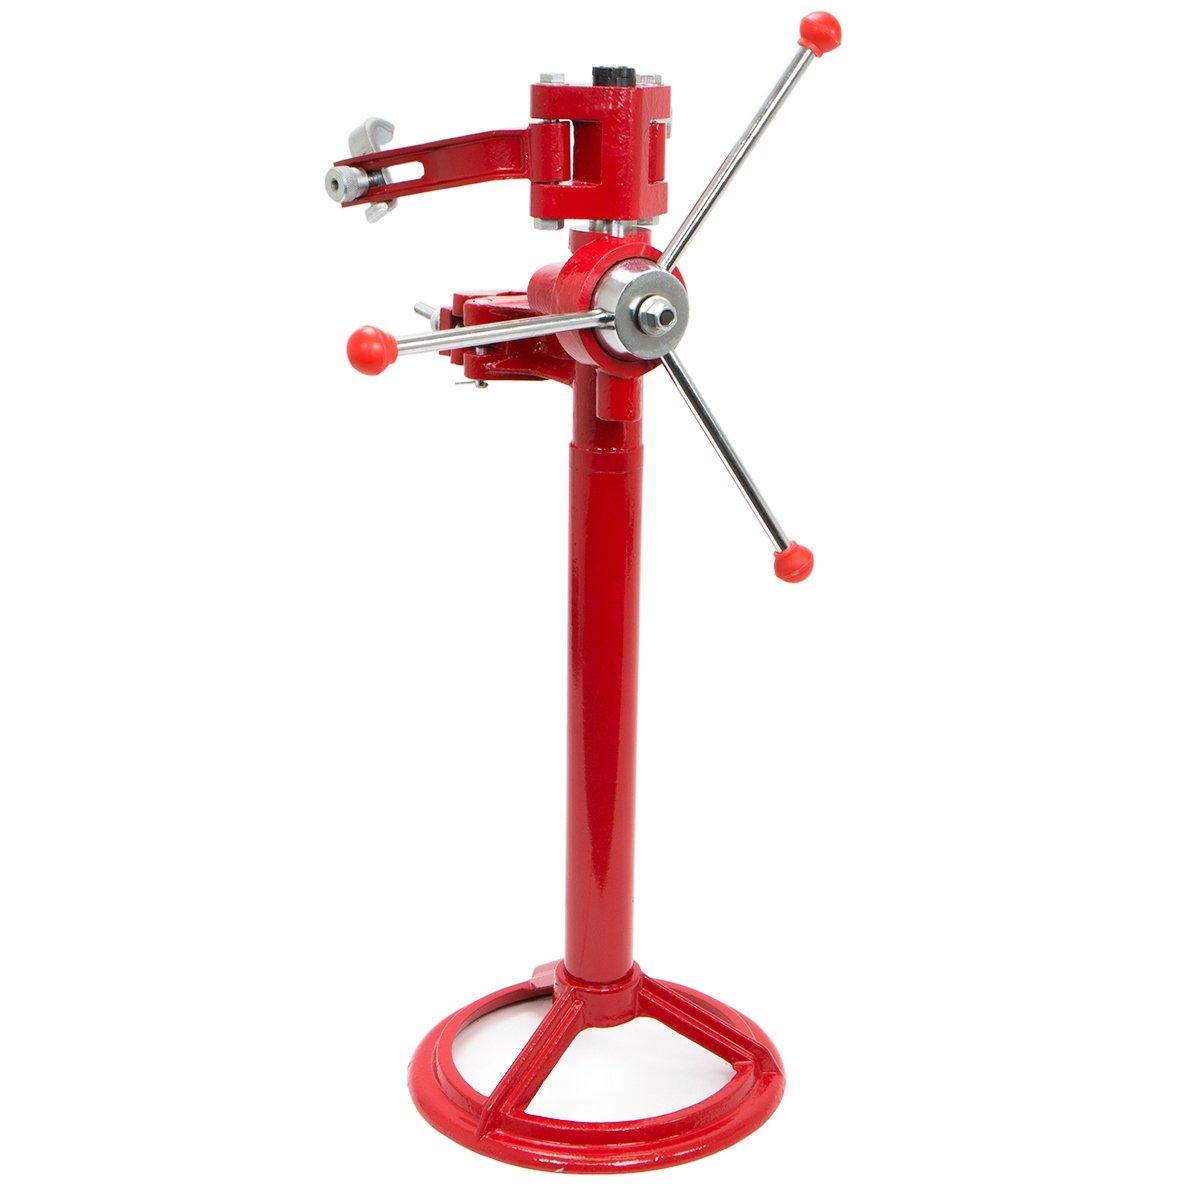 Strut Coil Spring Compressor Press Hand Operation Tool Equipment